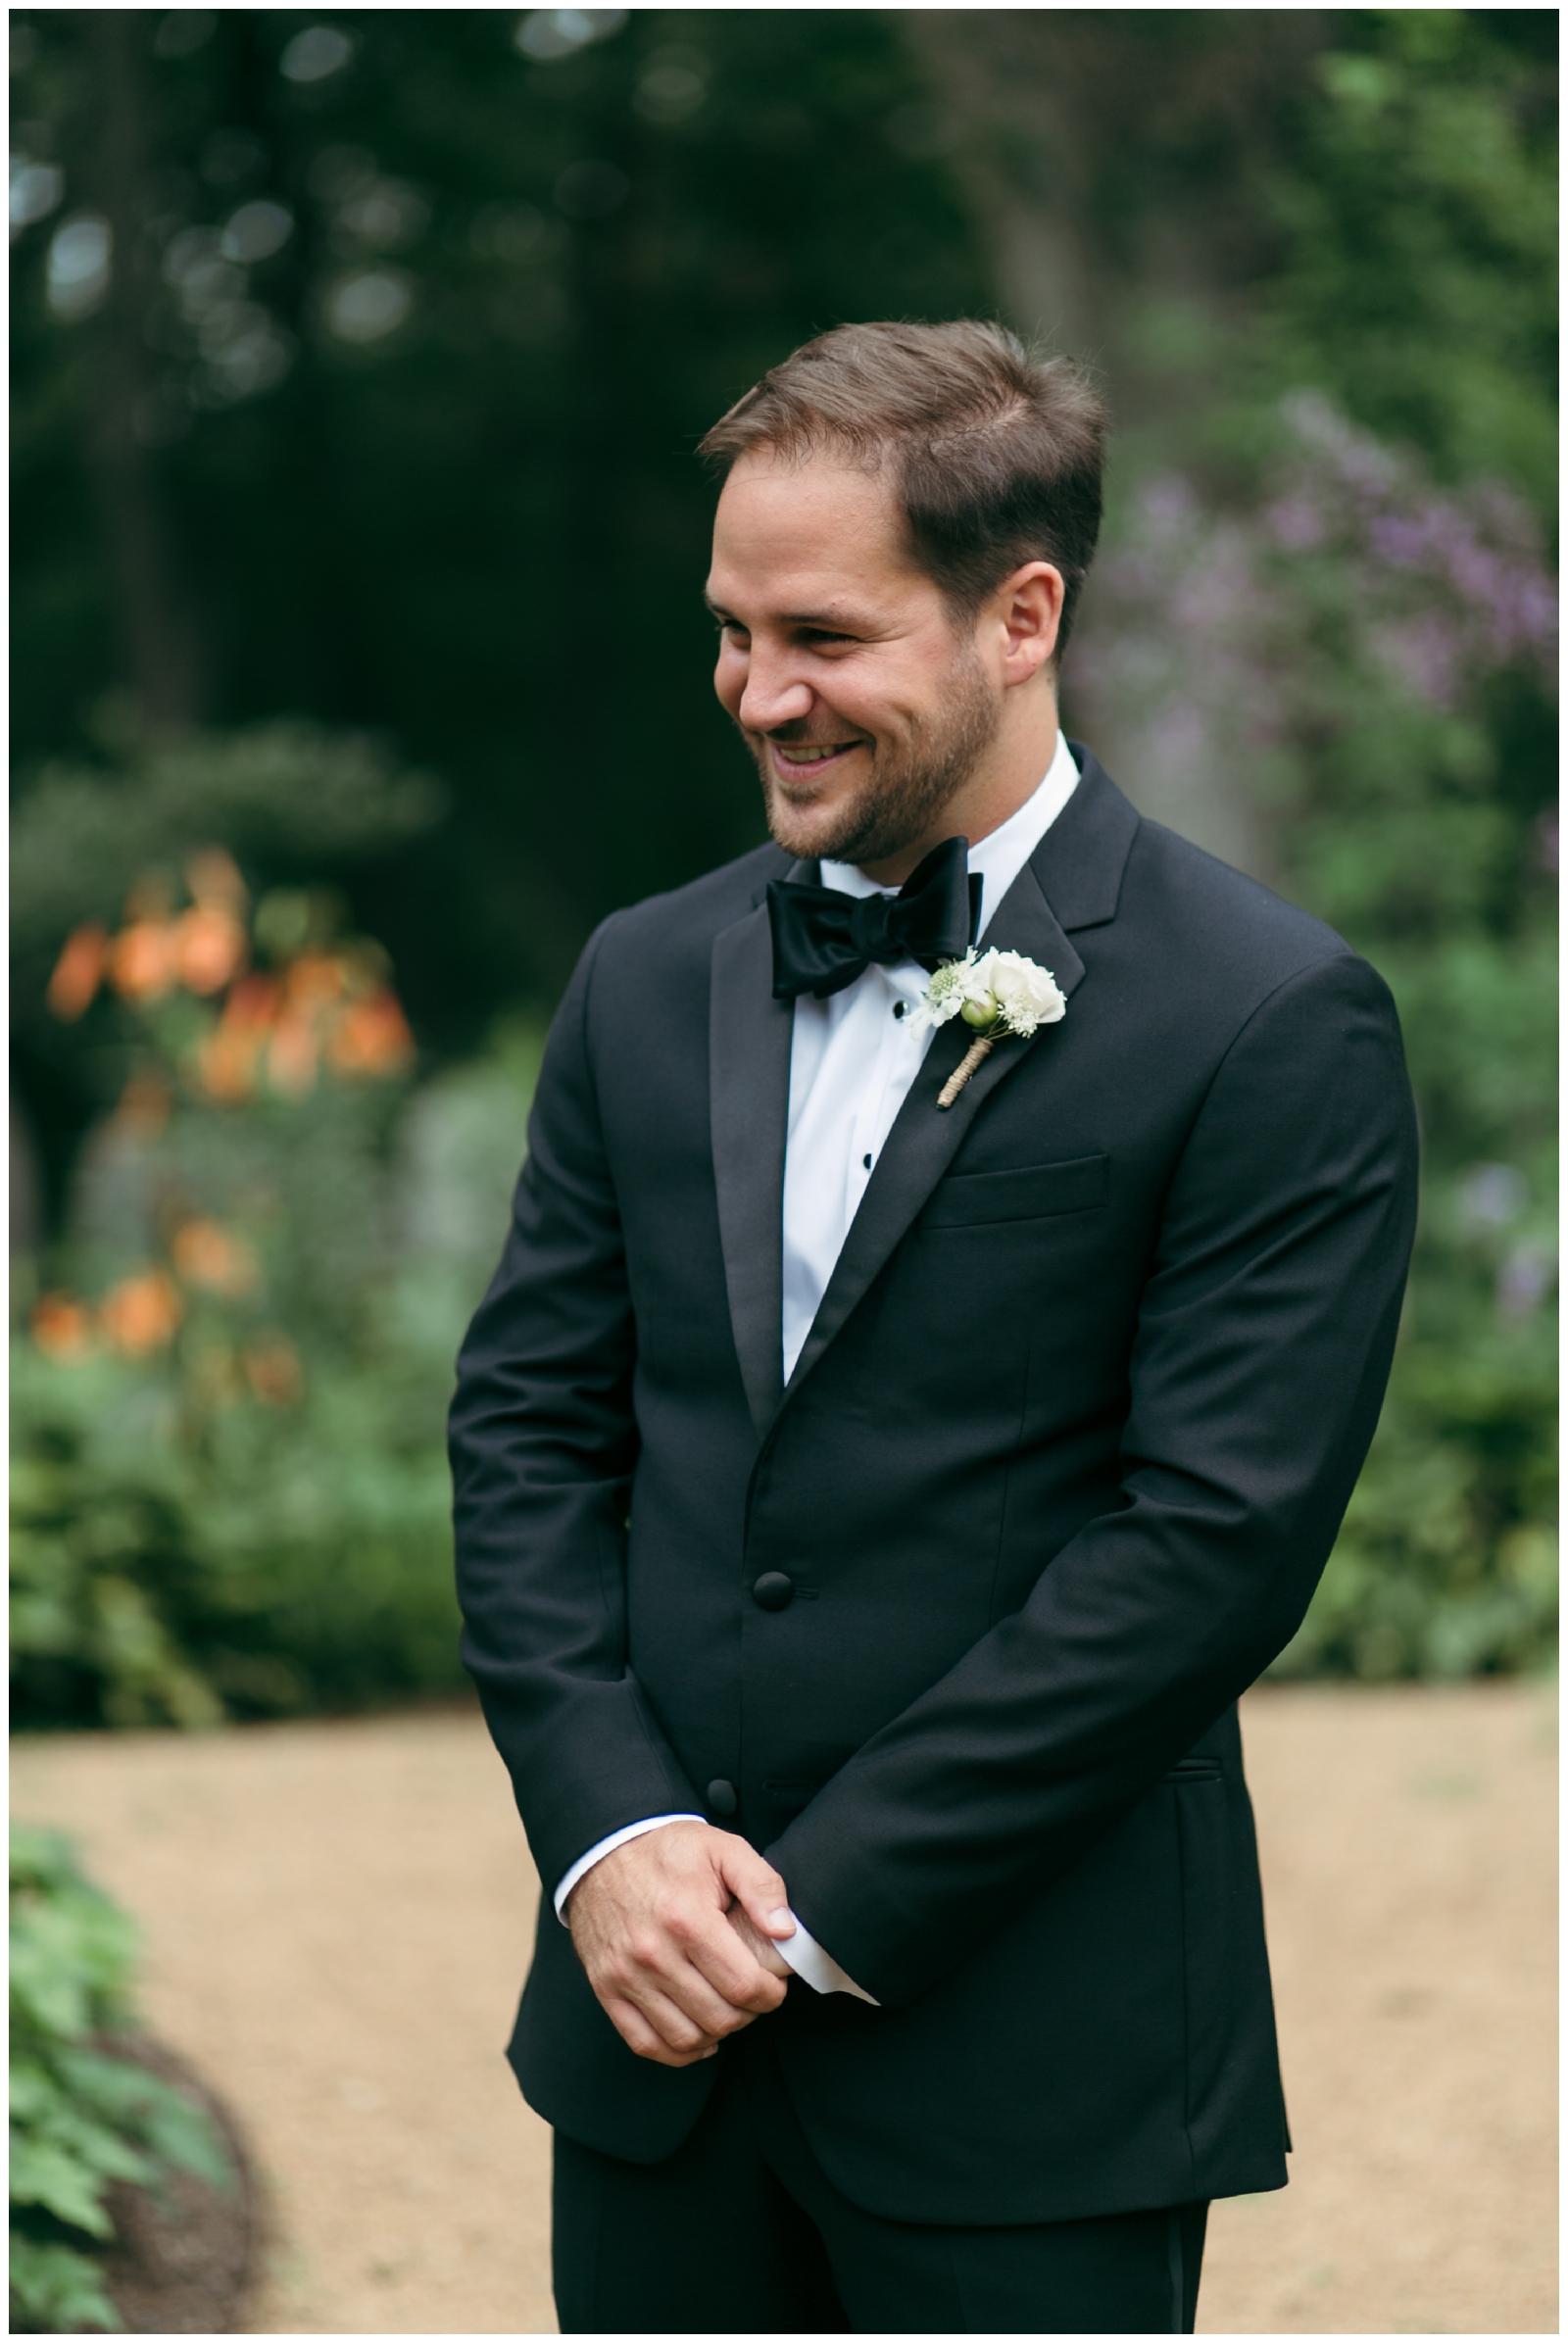 Moraine-Farm-wedding-Bailey-Q-Photo-Massachusetts-wedding-photpgrapher-015.jpg